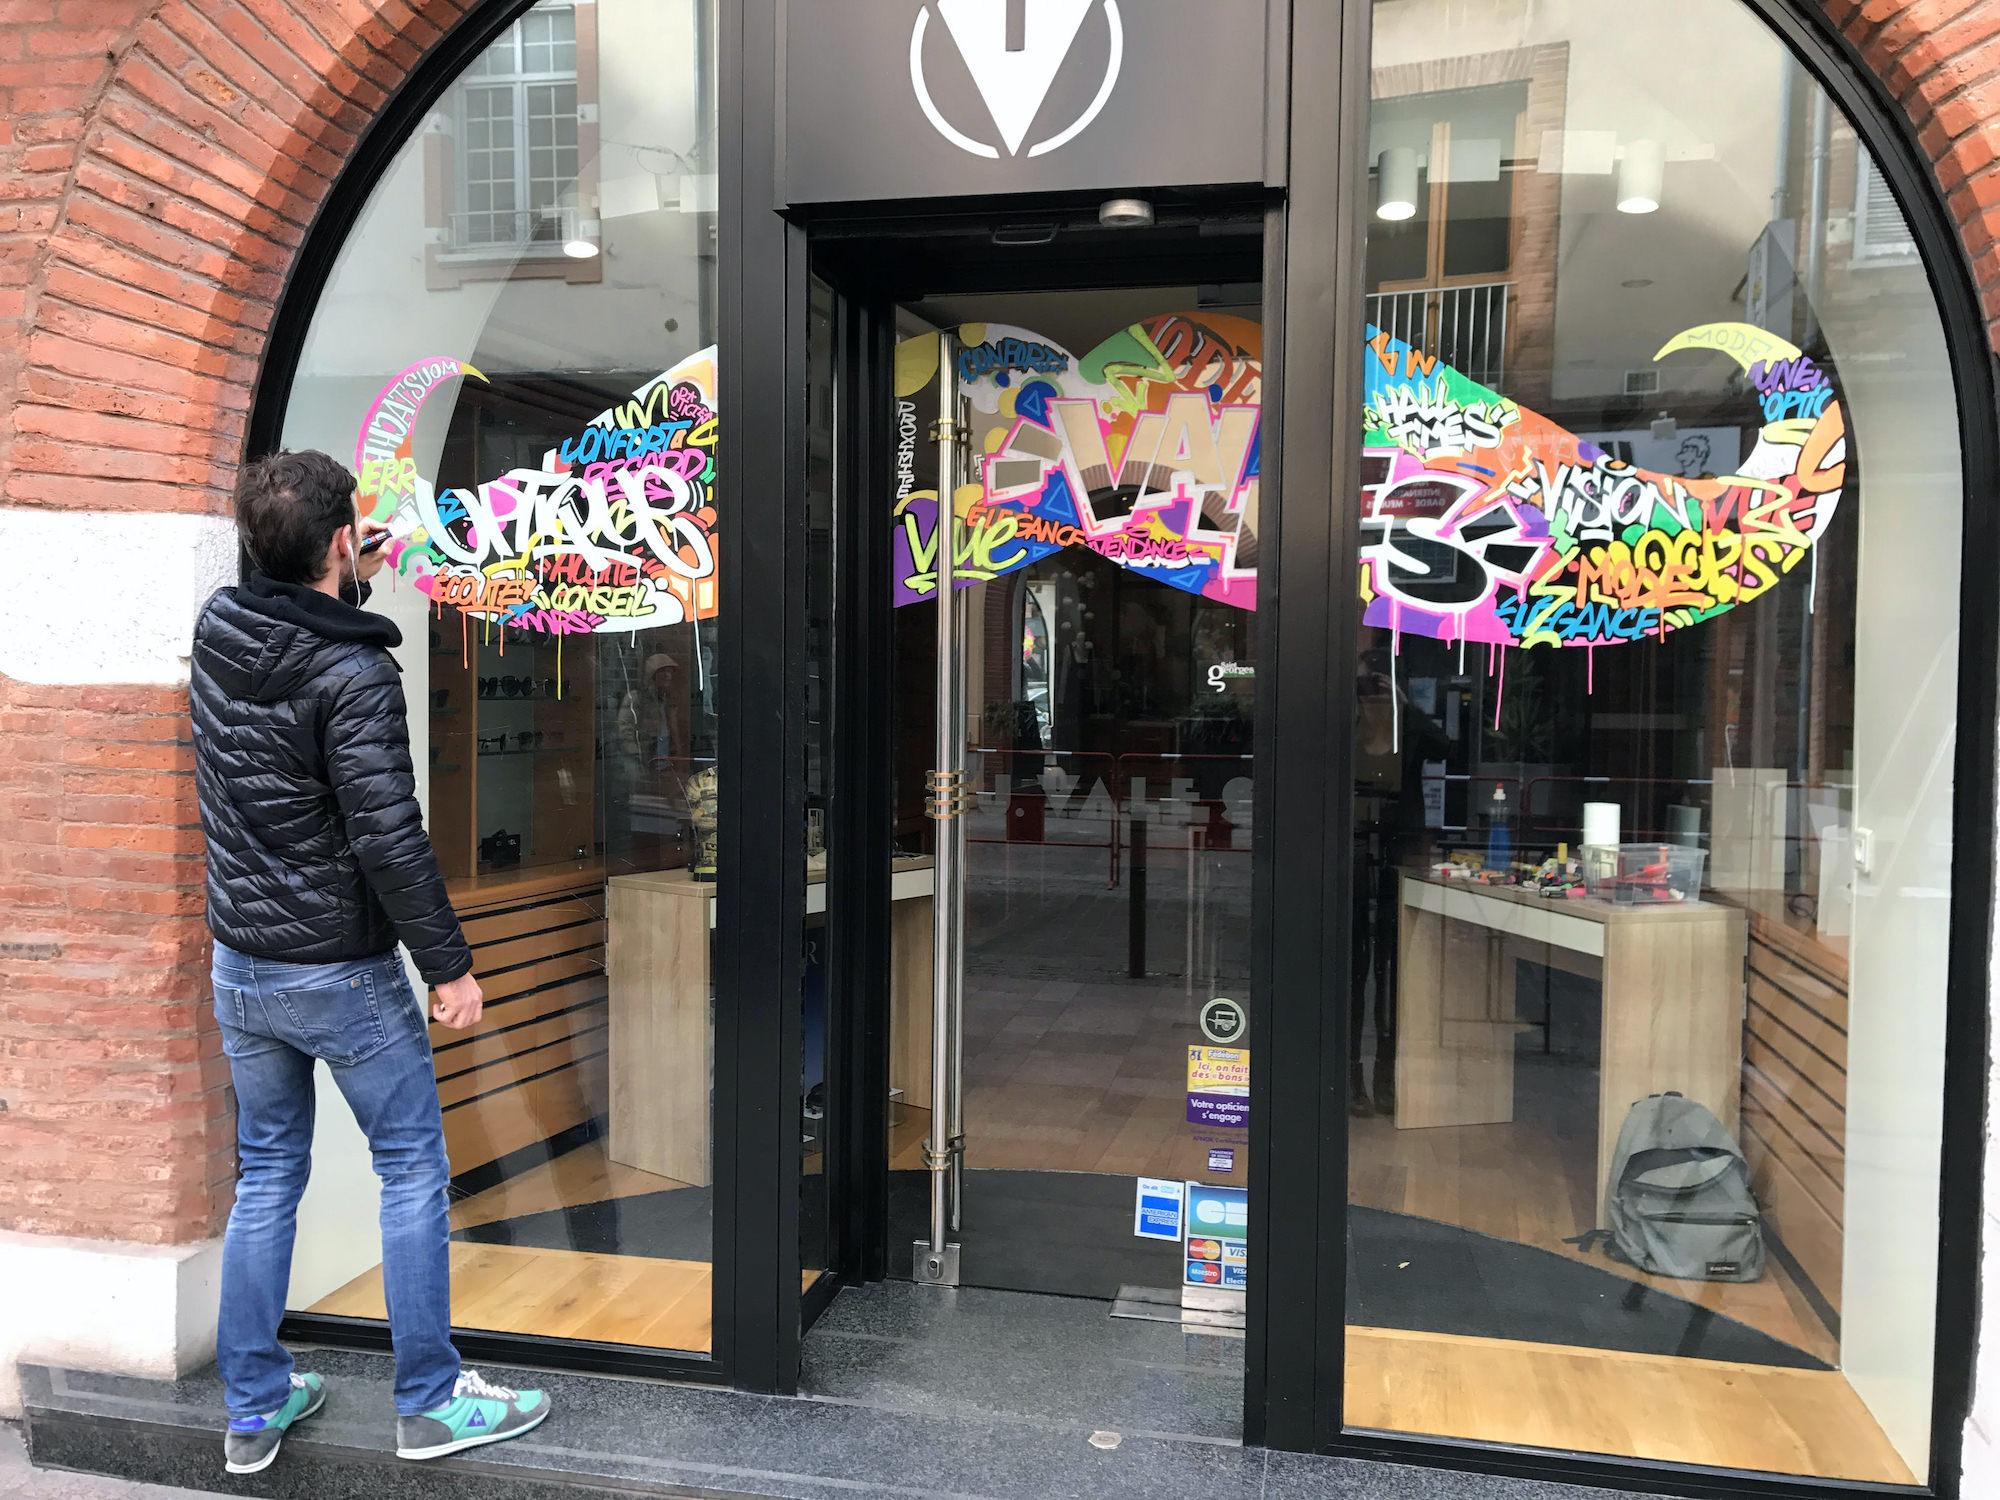 graffeur toulouse vitrine deco art tag graffiti